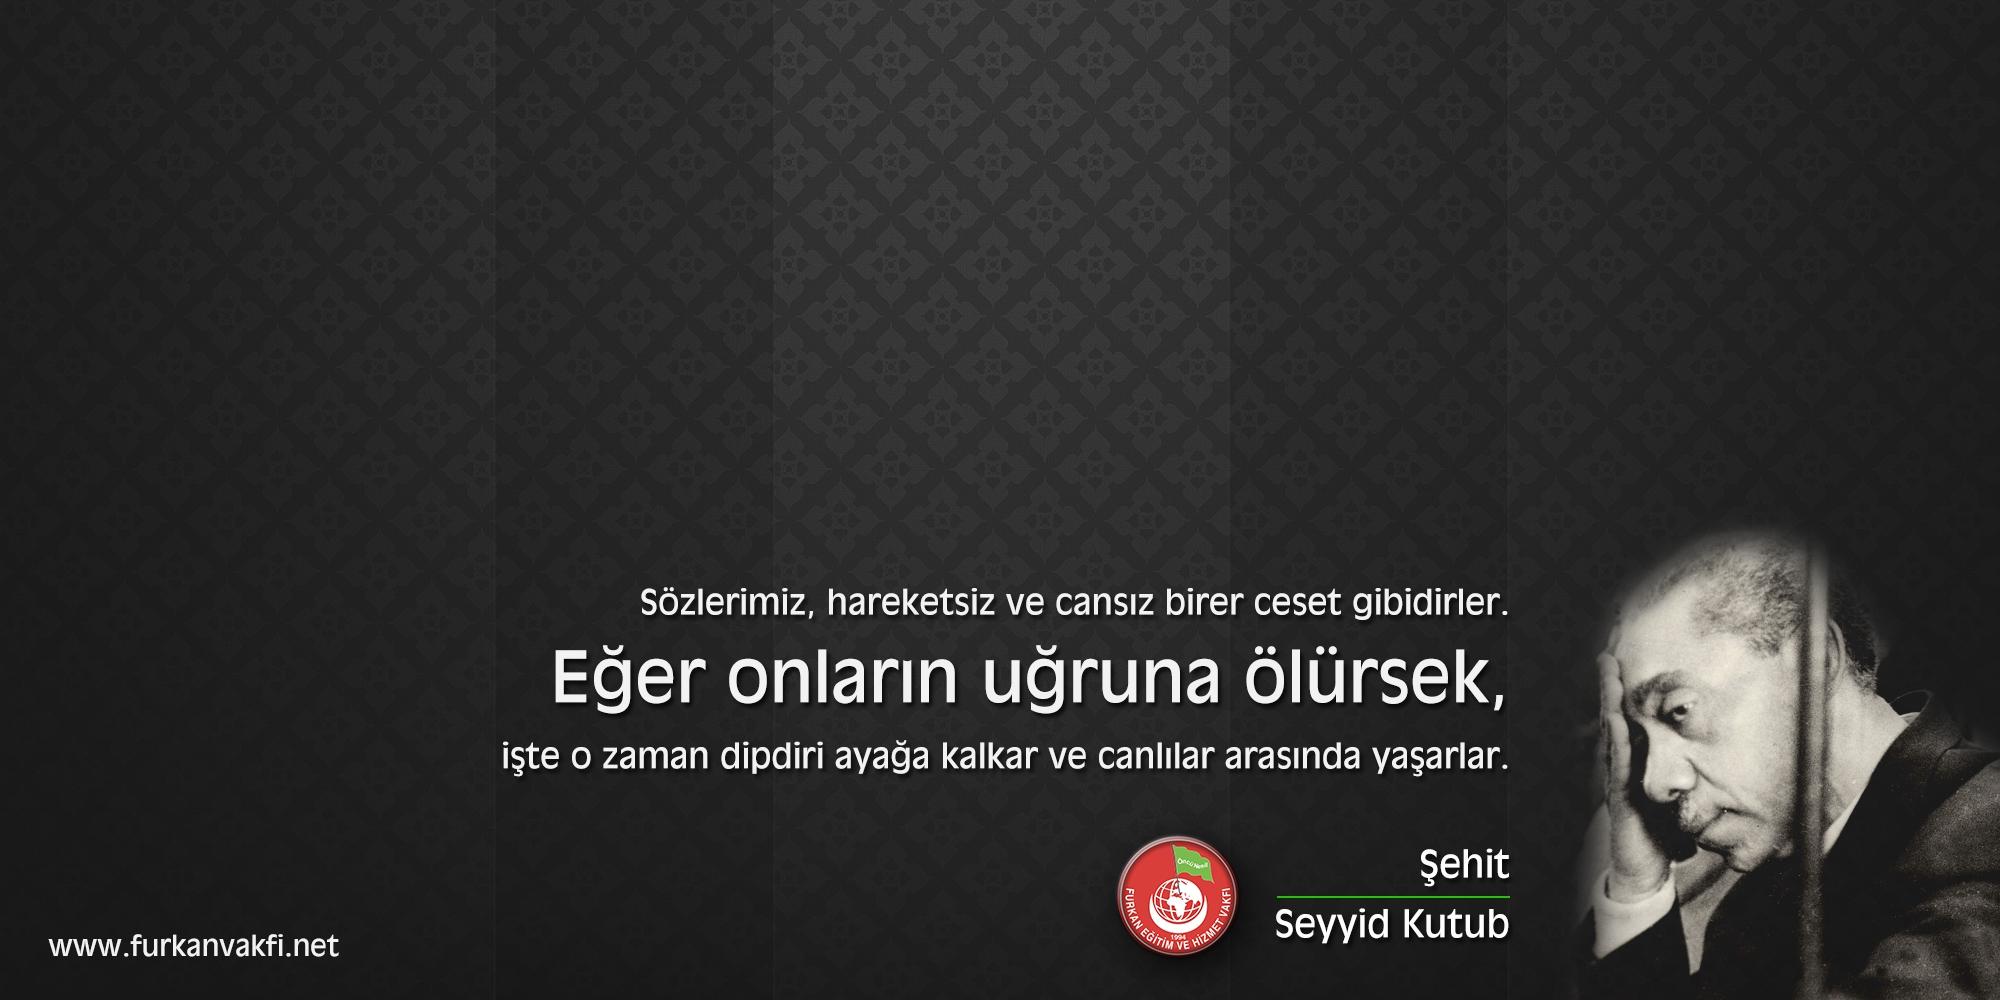 6821_furkan_vakfi_alparslan_kuytul